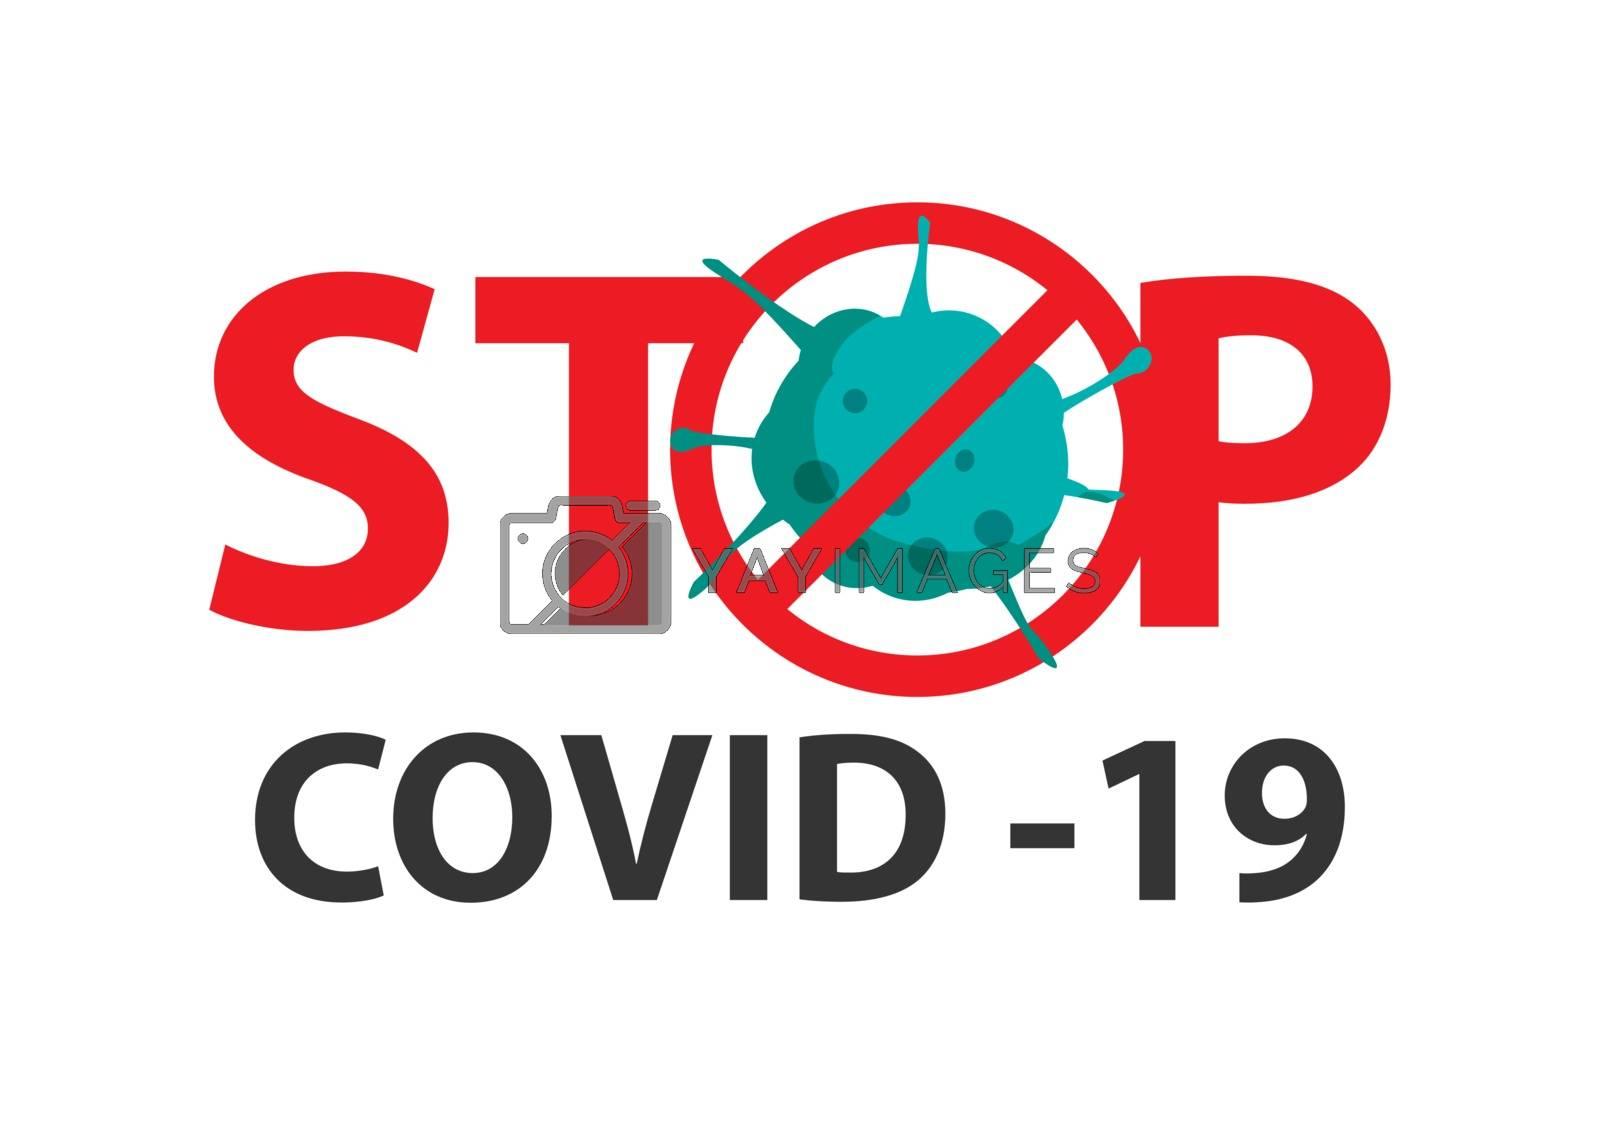 Stop covid 19 coronavirus with red symbol danger sign.